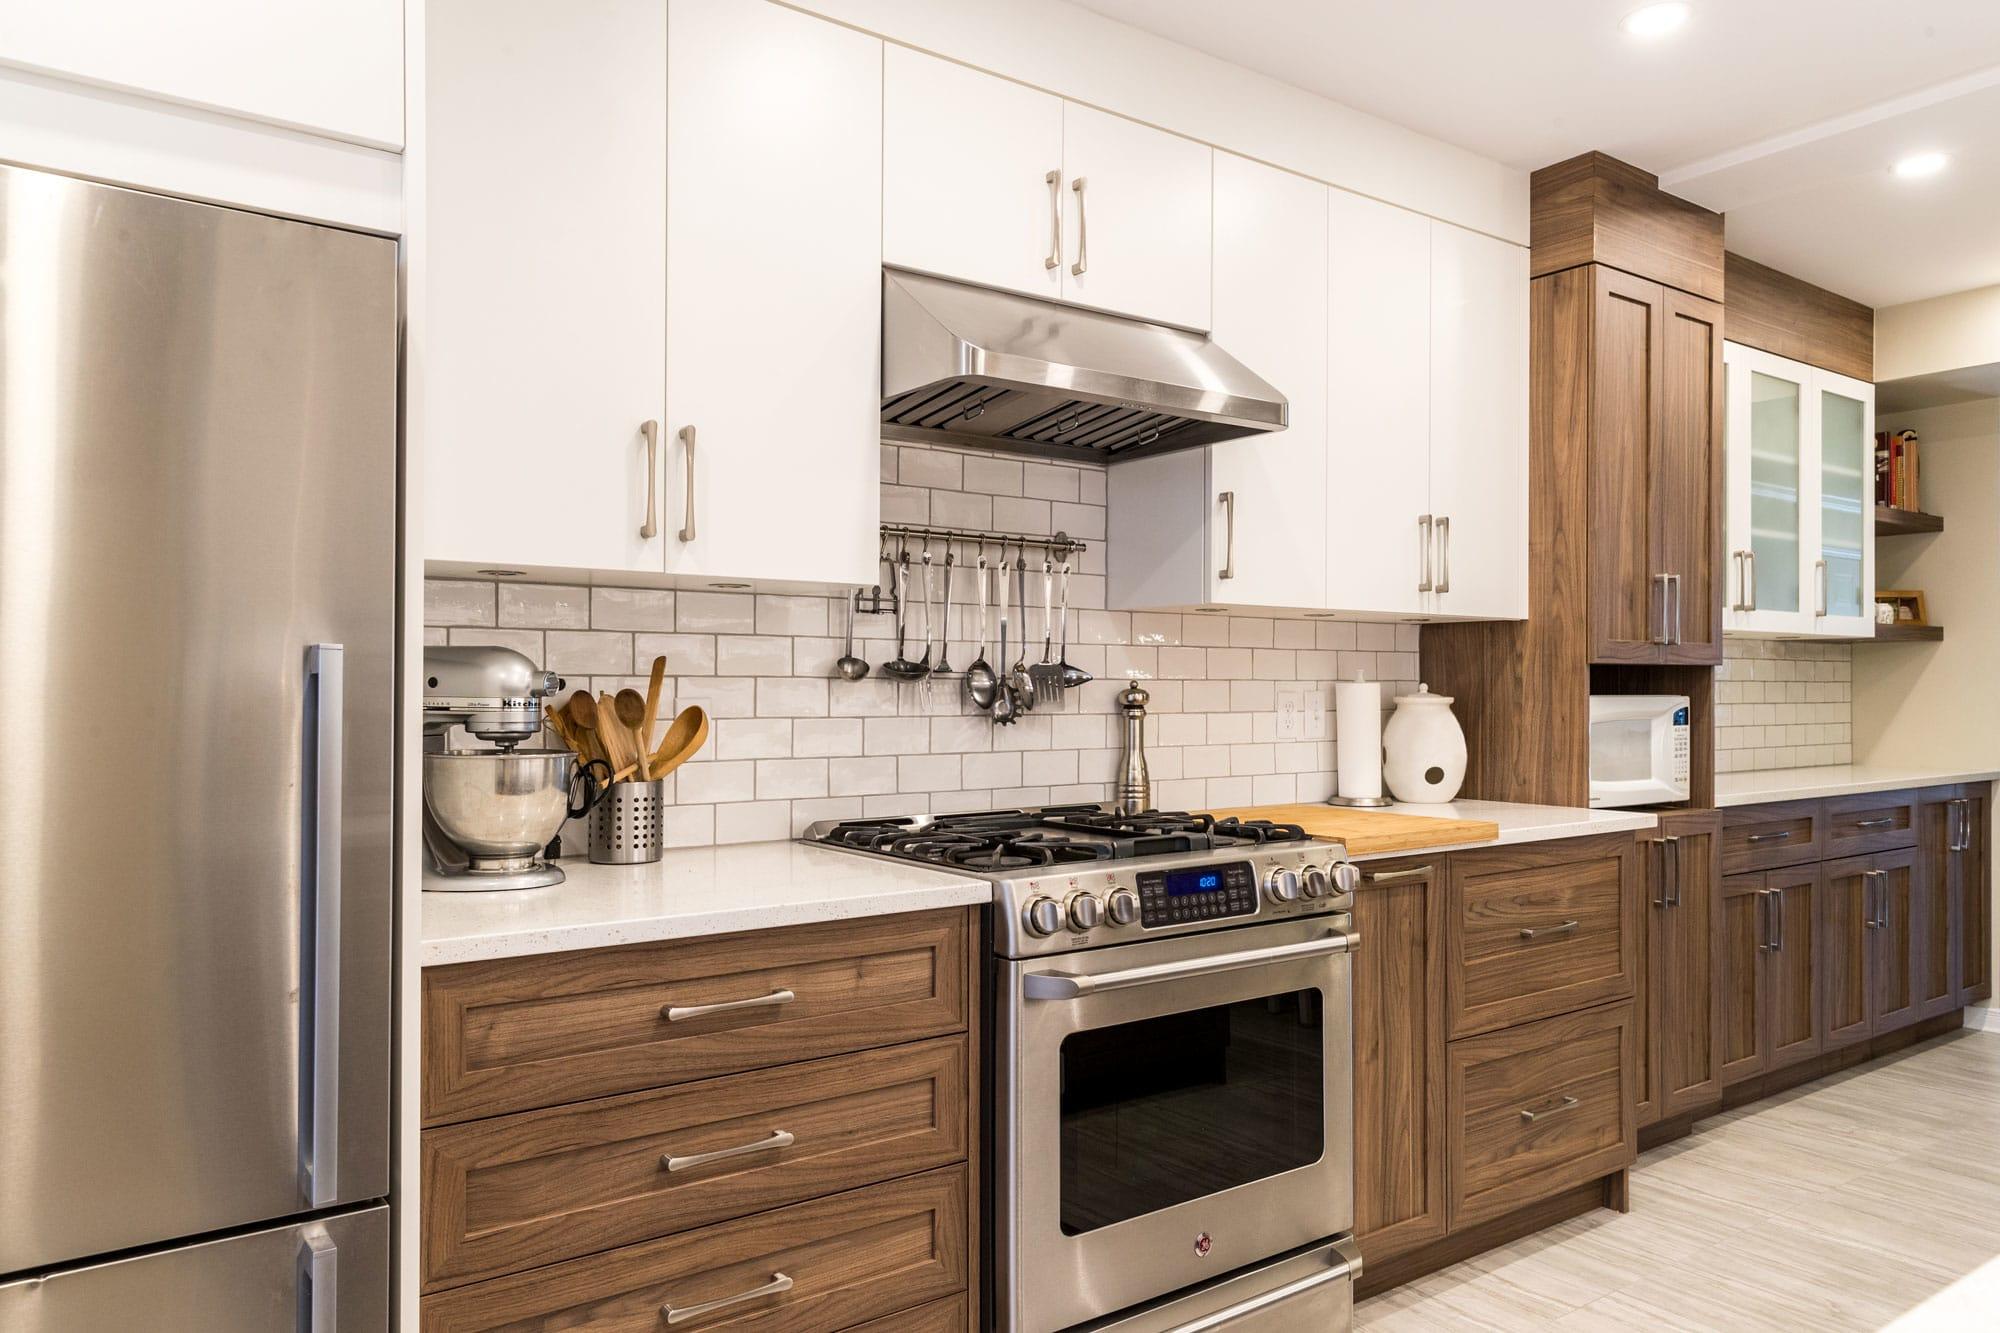 kitchen renovation (two tones)